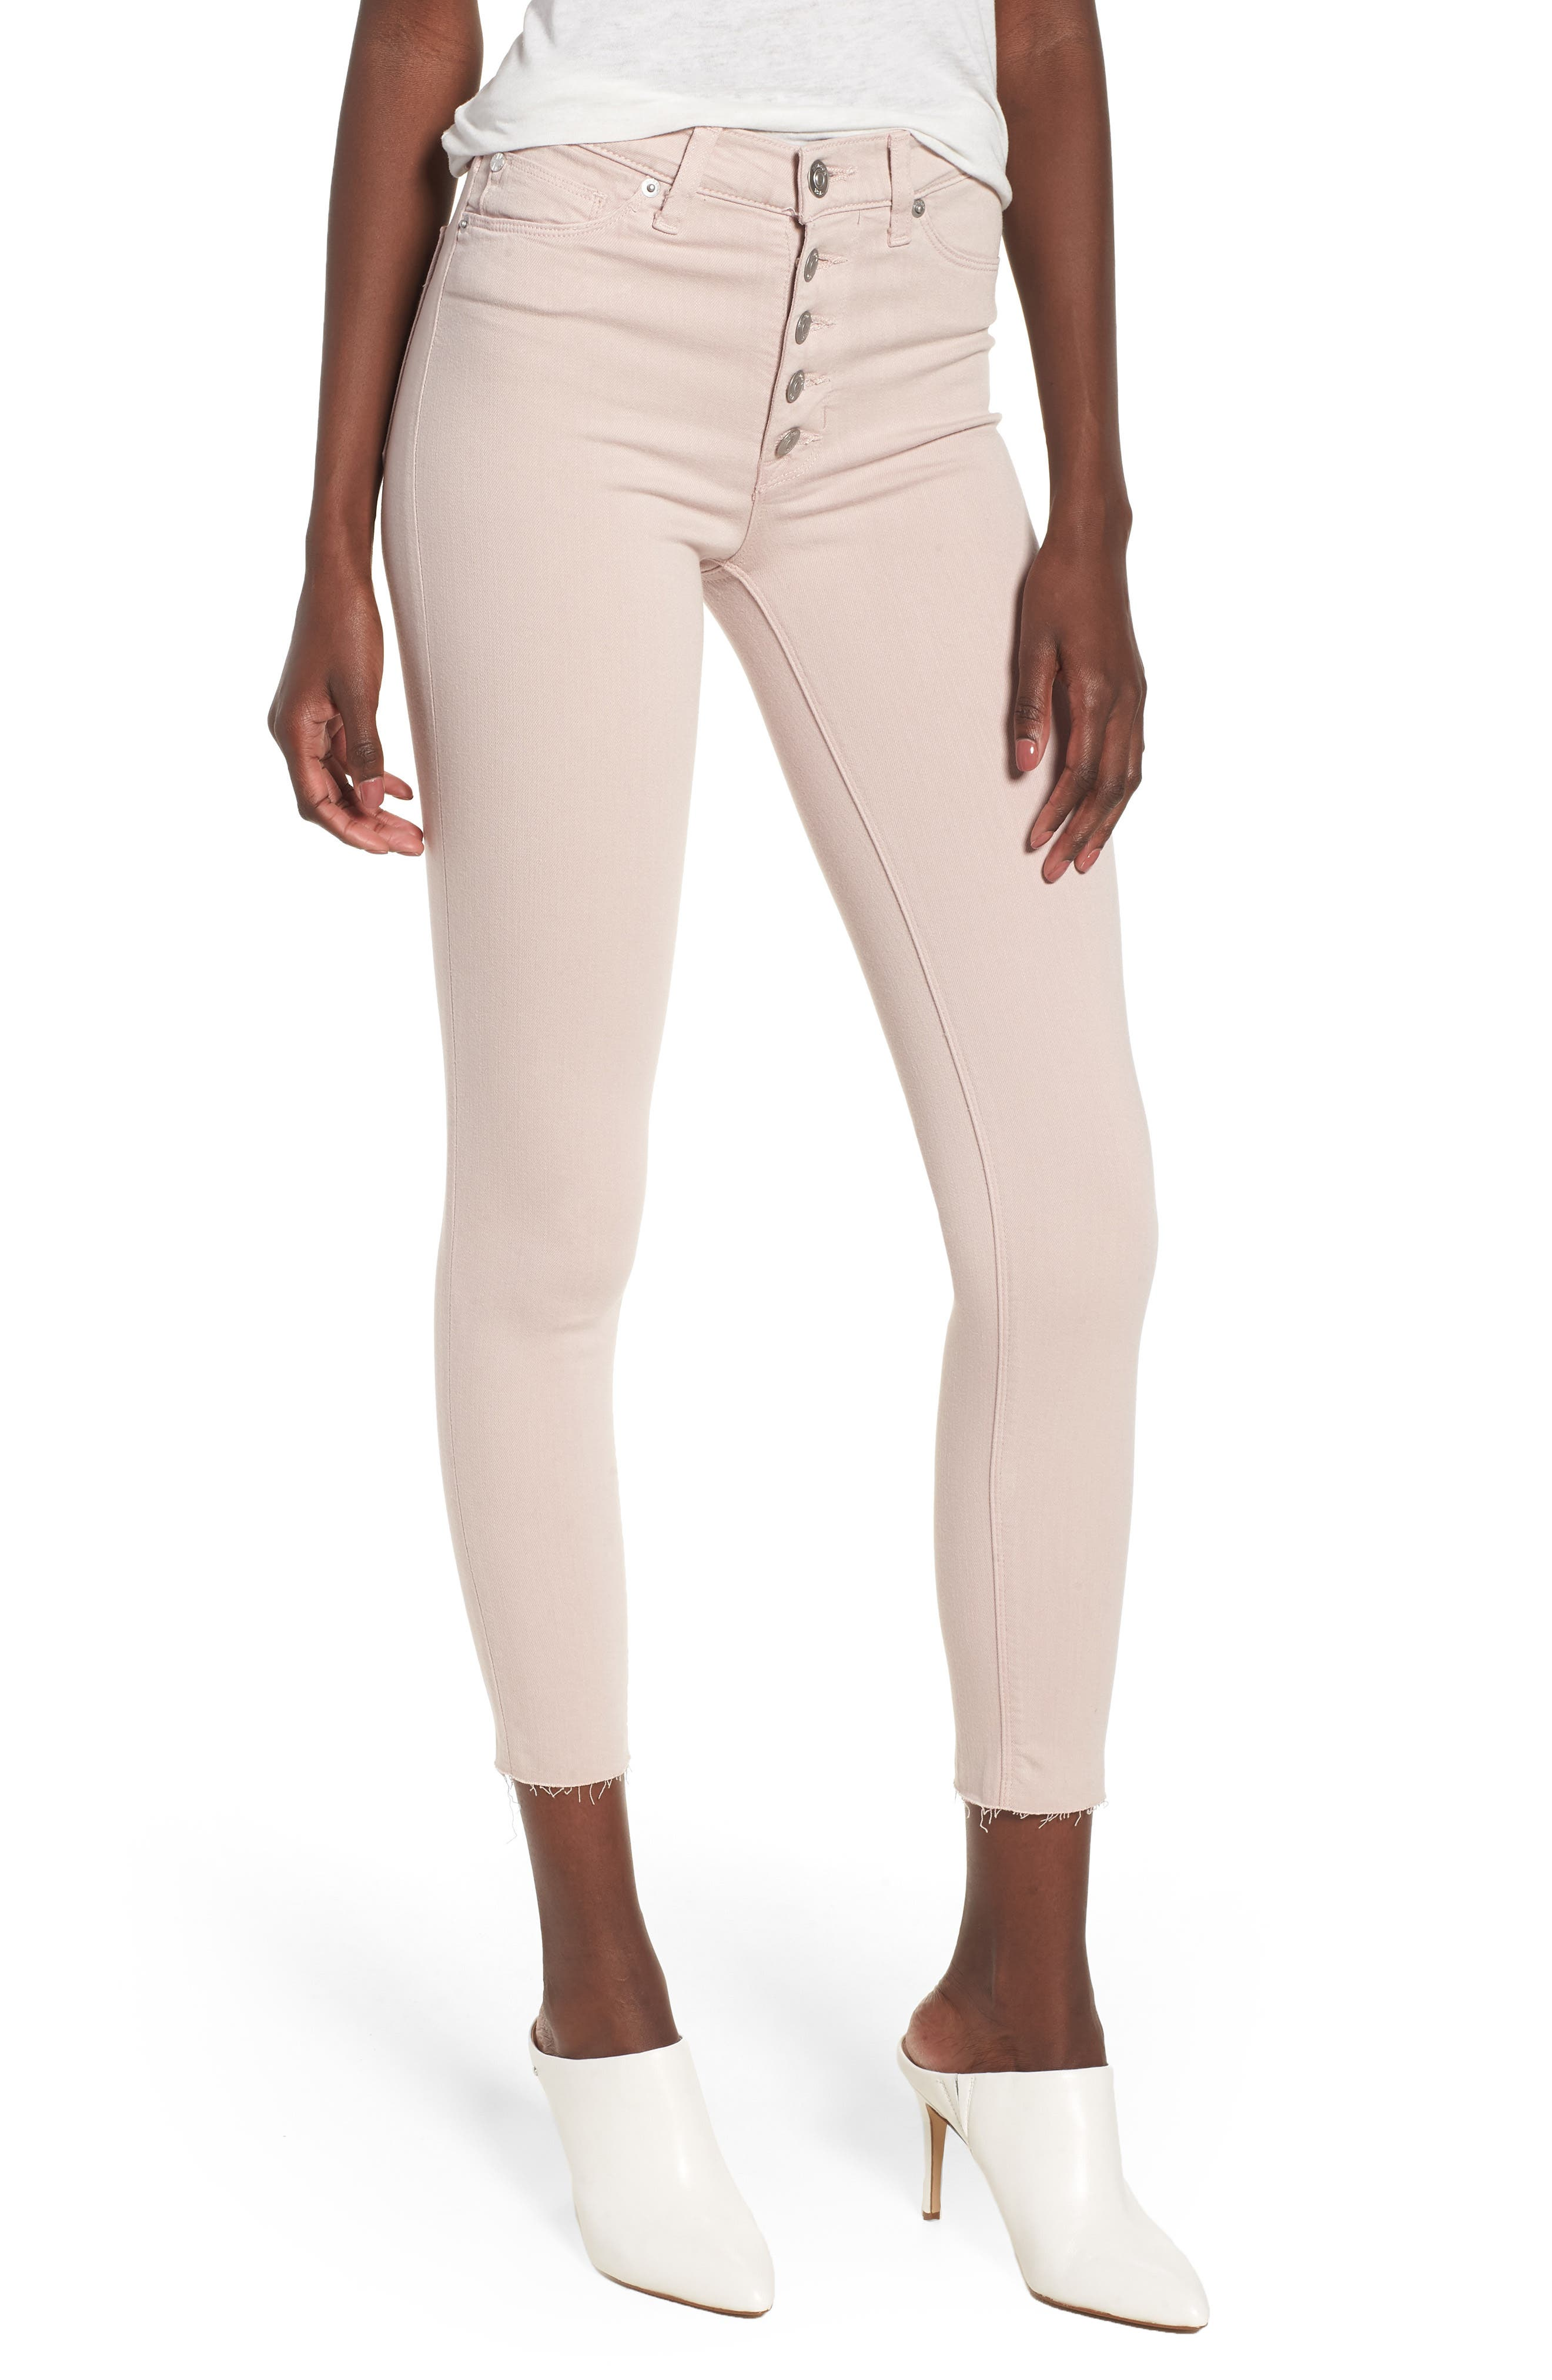 Barbara High Waist Raw Hem Ankle Skinny Jeans,                             Main thumbnail 1, color,                             Blushing